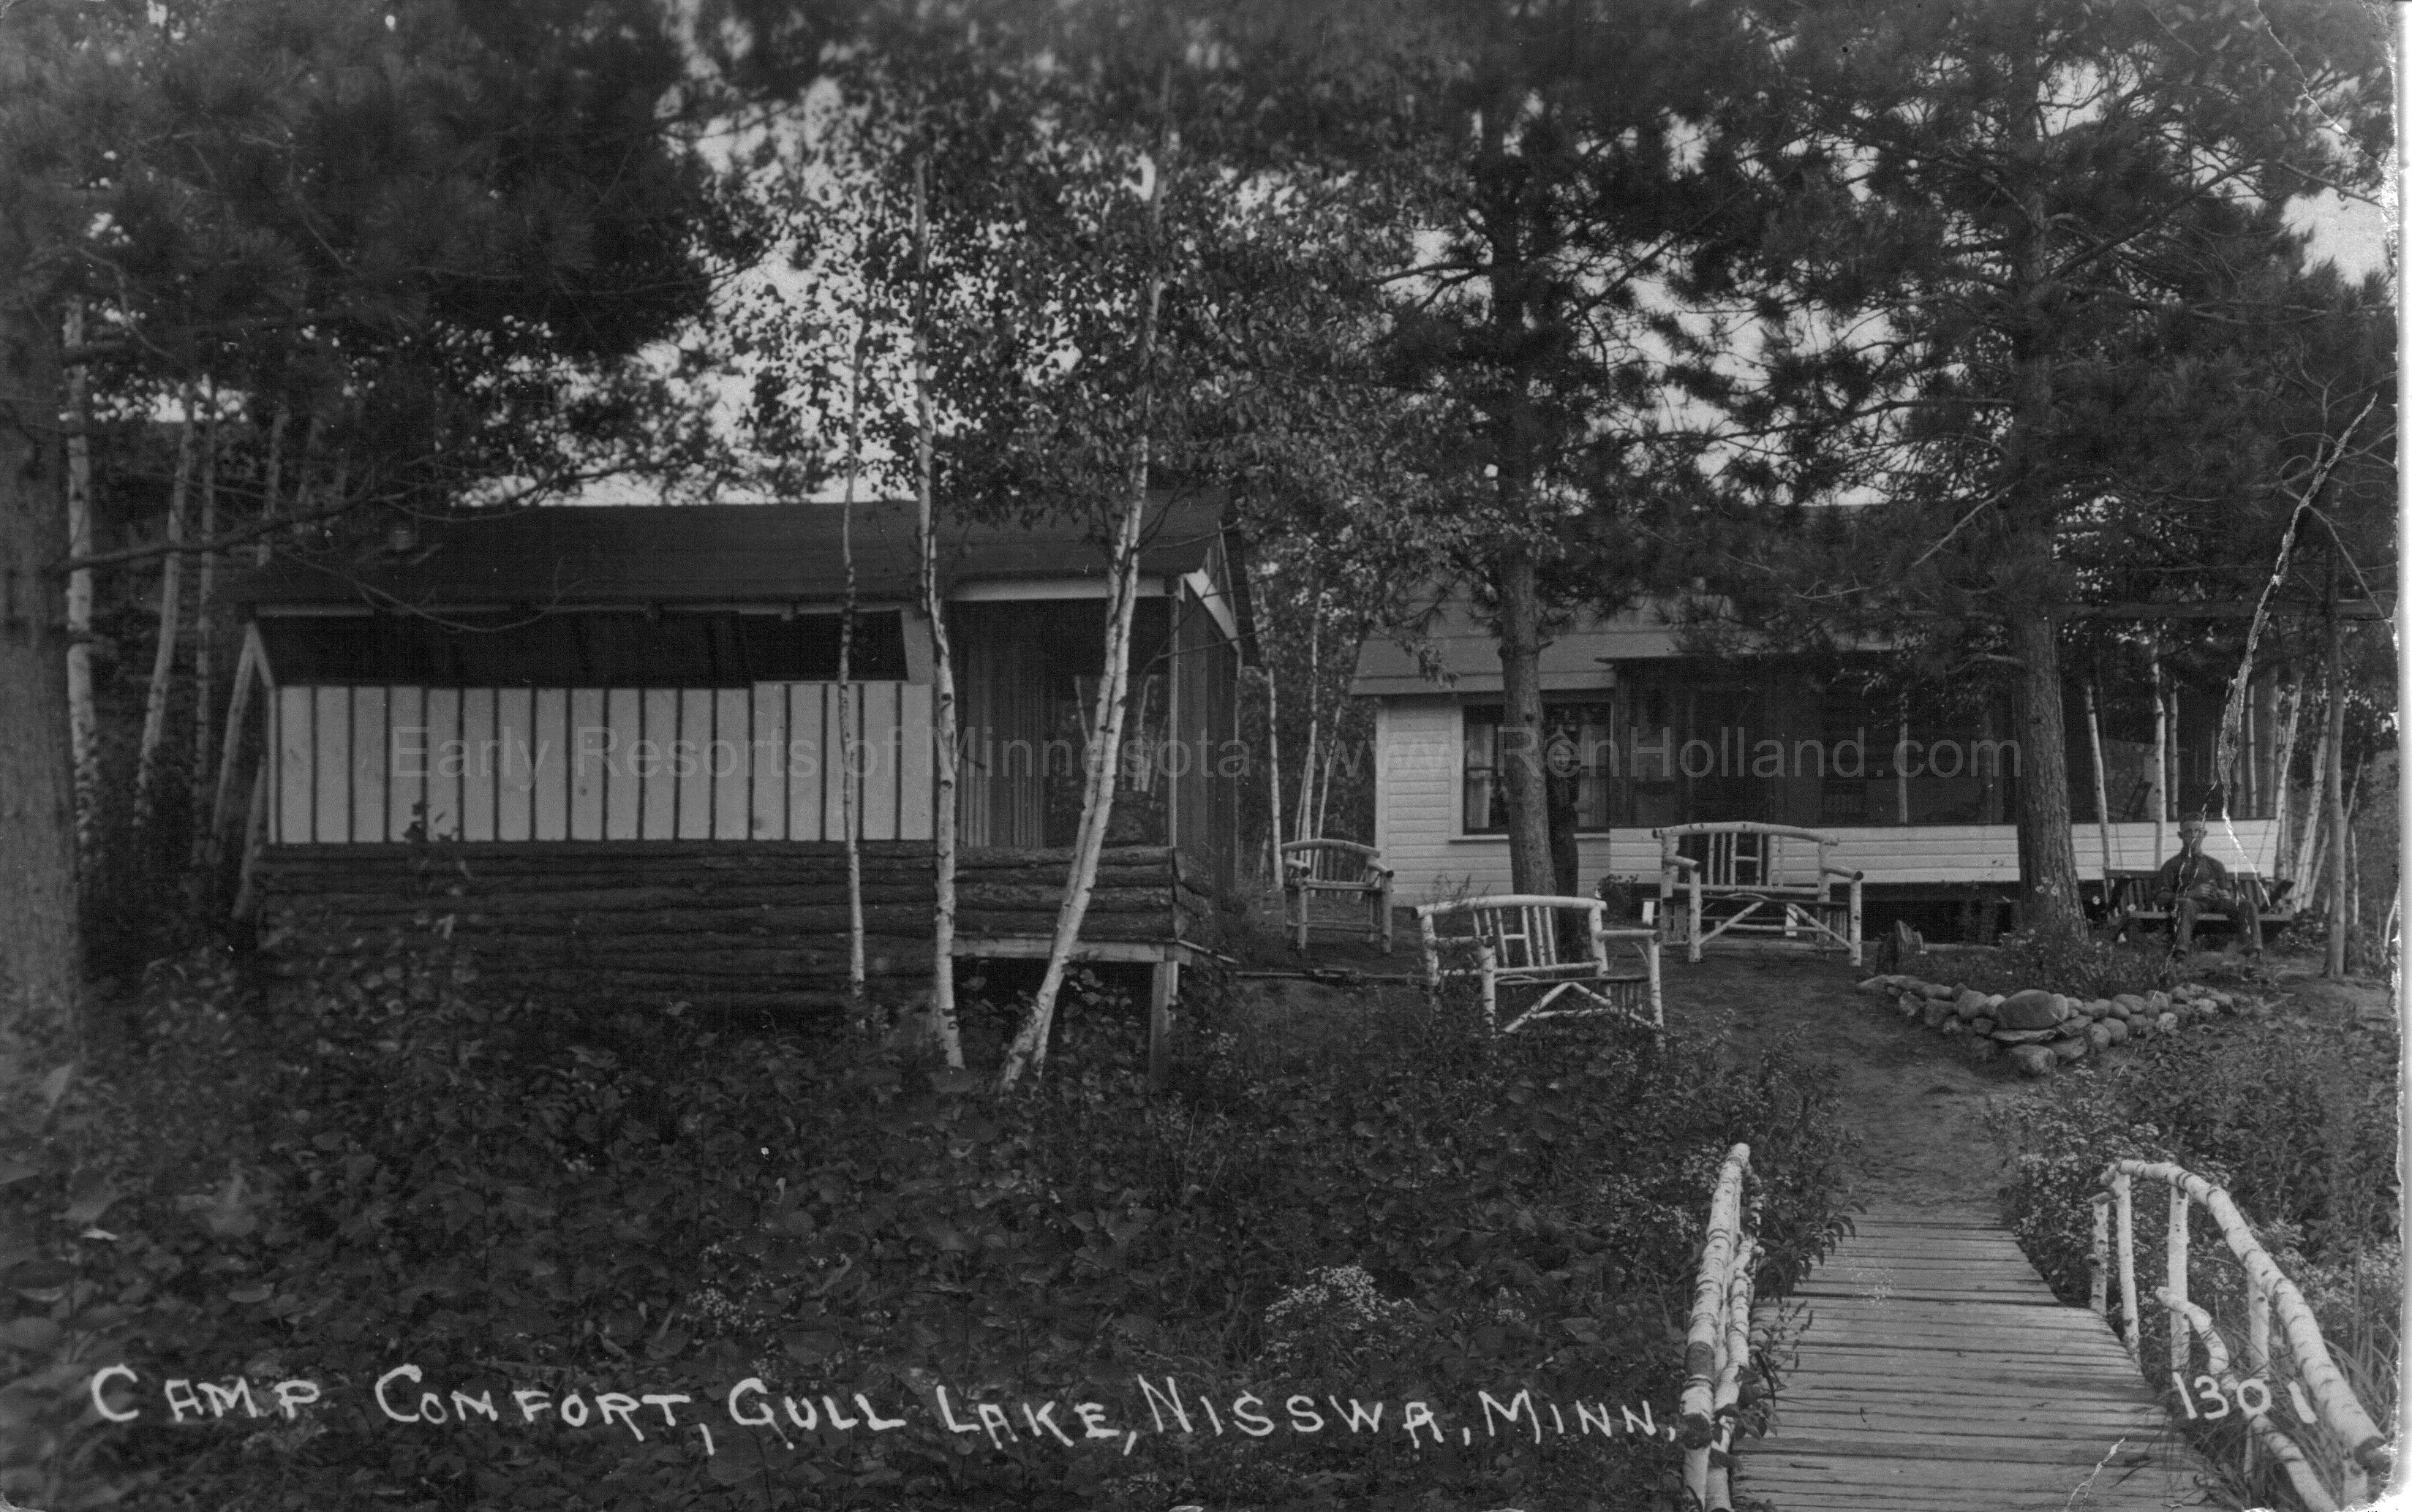 Early Resorts Of Minnesota Photos Ren Hollands Website